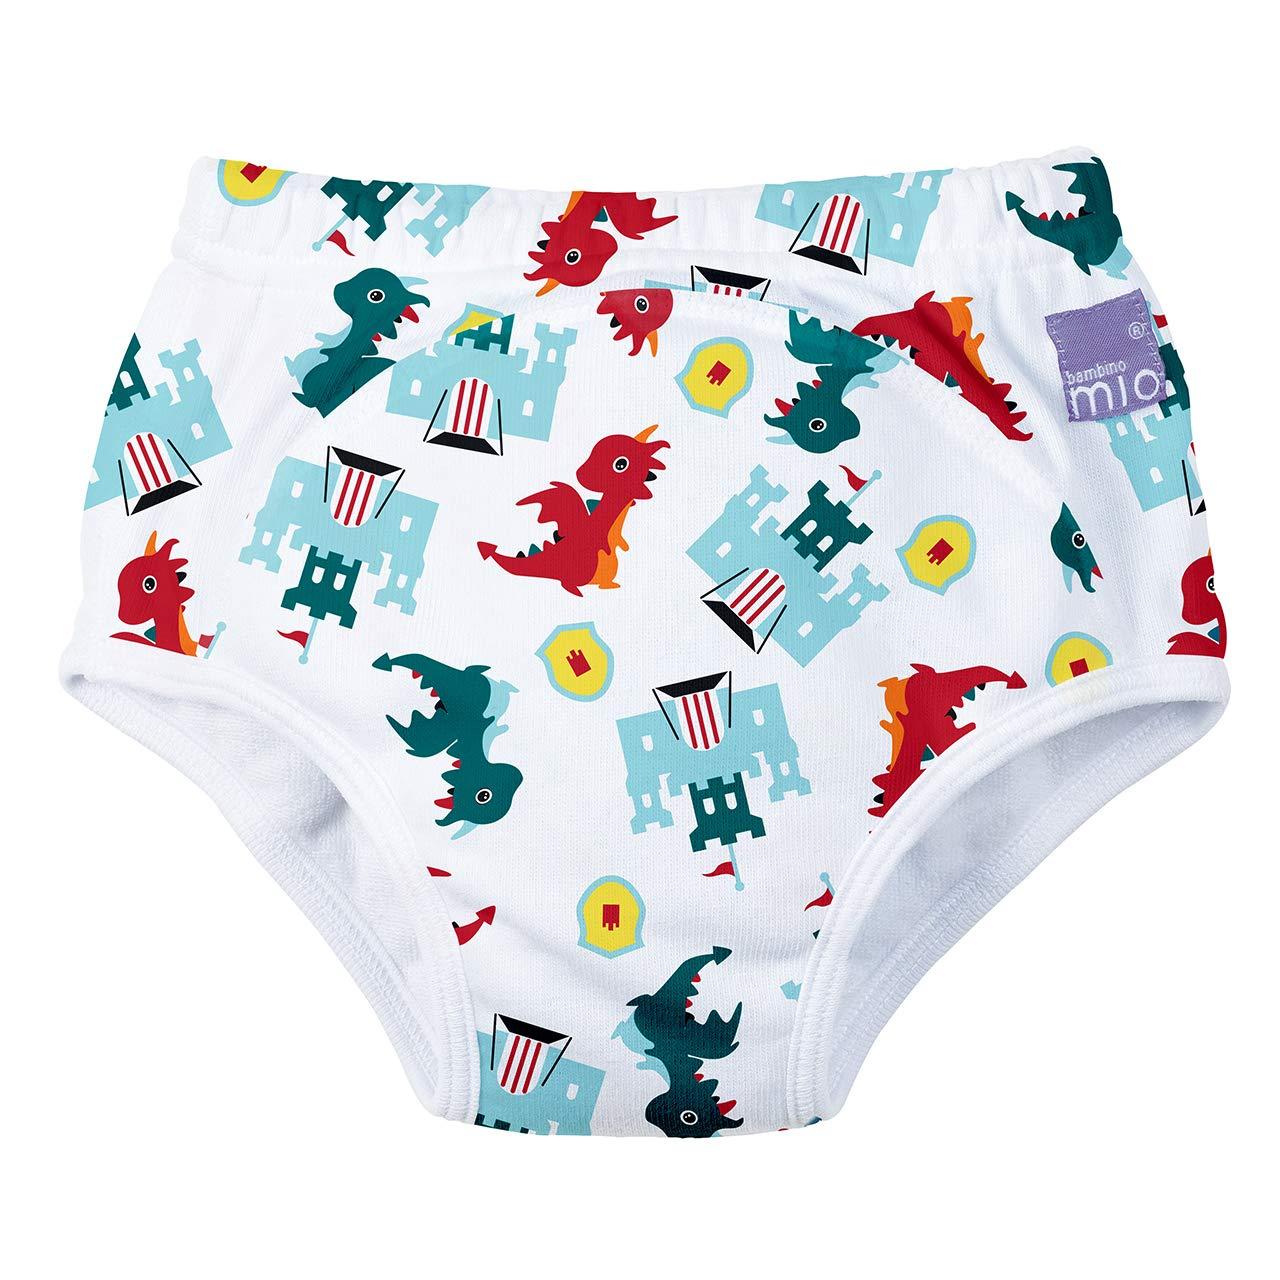 Bambino Mio Potty Training Pants, Dragon's Dungeon, 2-3 Years